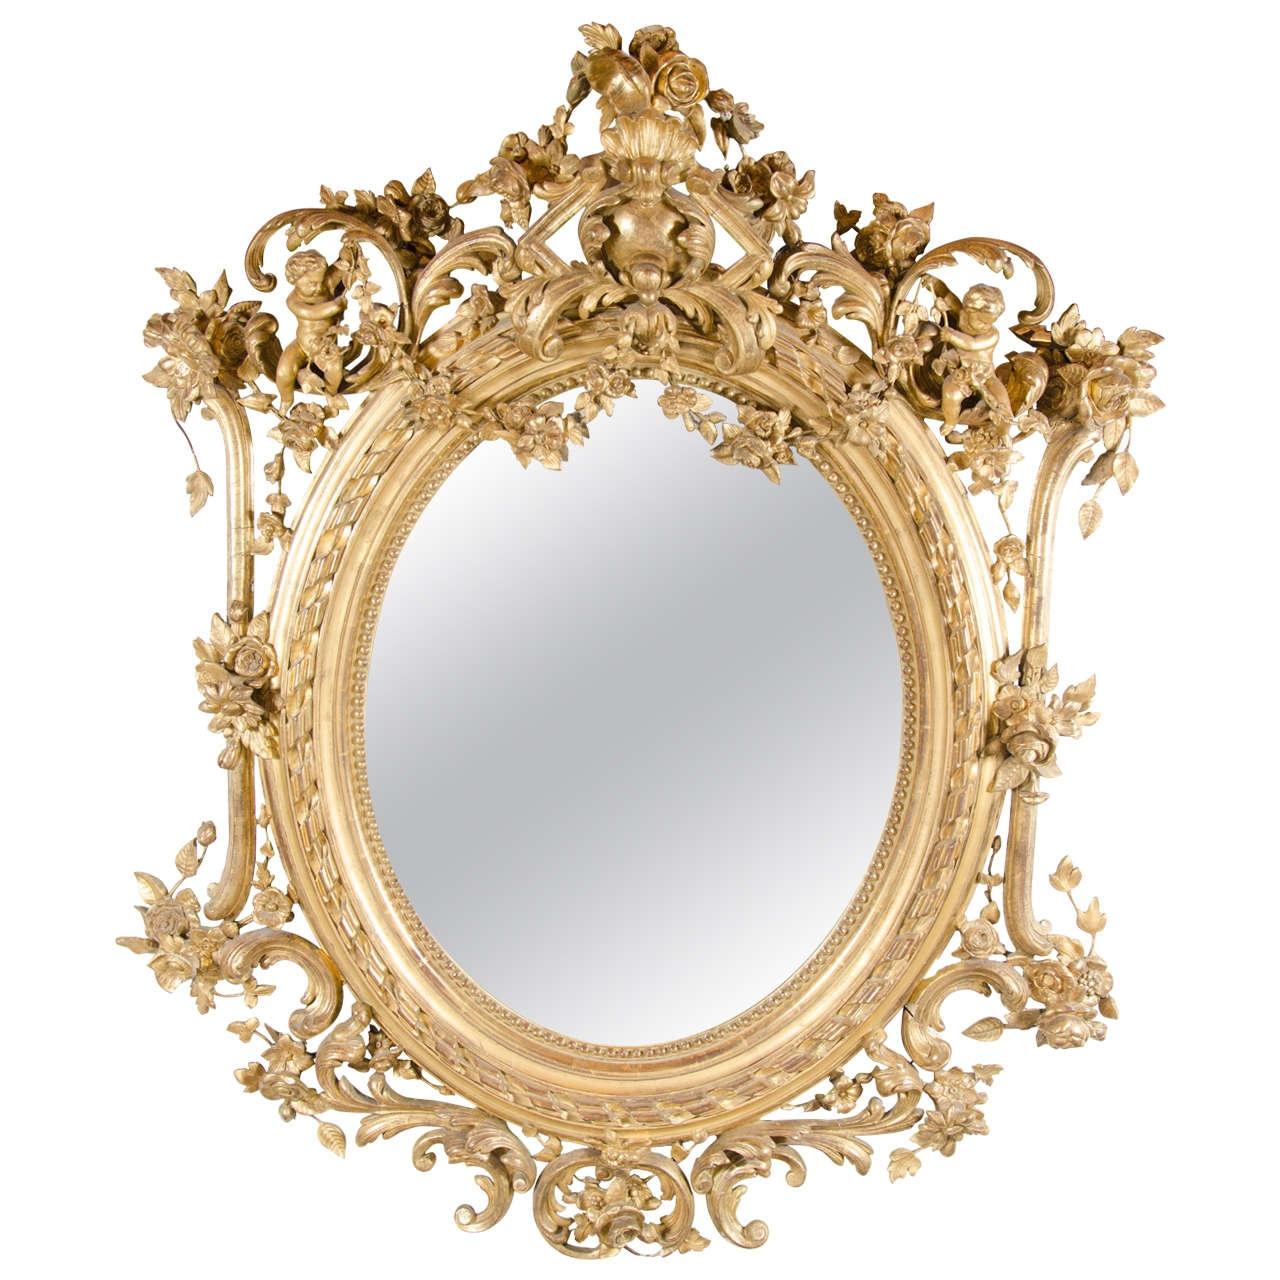 15 collection of rococo mirrors cheap mirror ideas